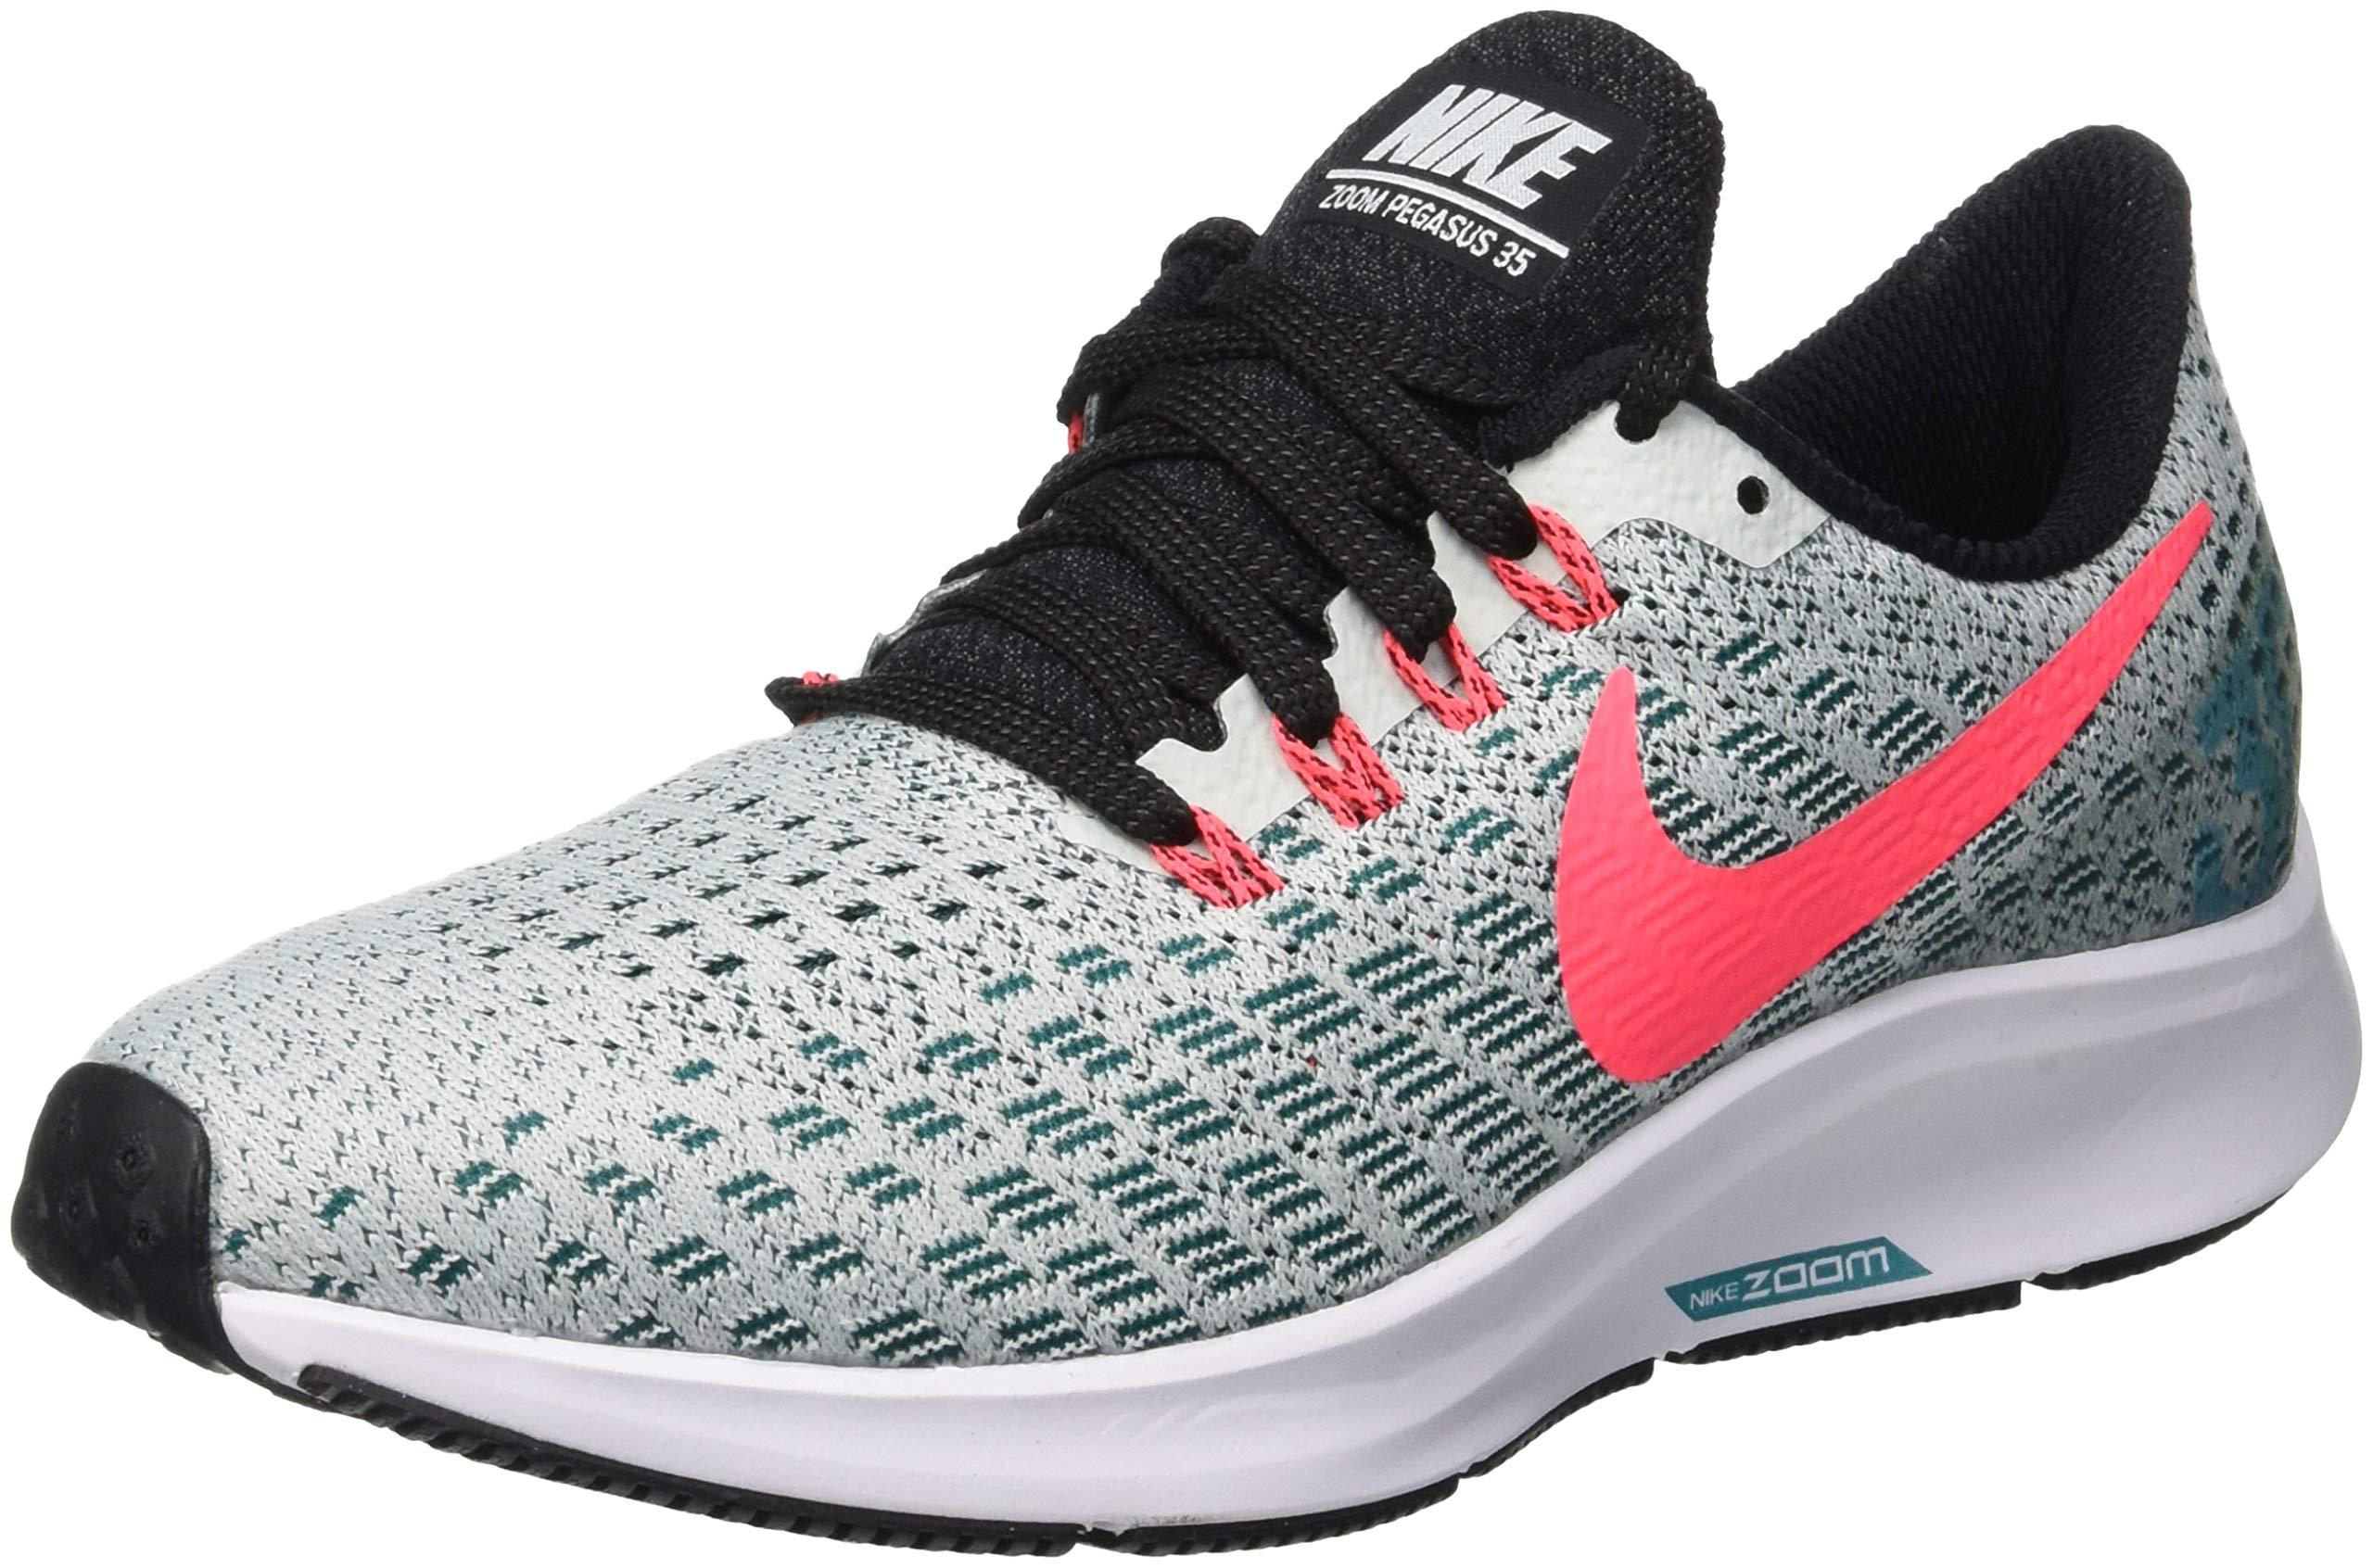 Nike Air Zoom Pegasus 35, Women's Running, Multicolored (Barely Grey/Hot Punch/Geode Teal/Black 009), 2.5 UK (EU)